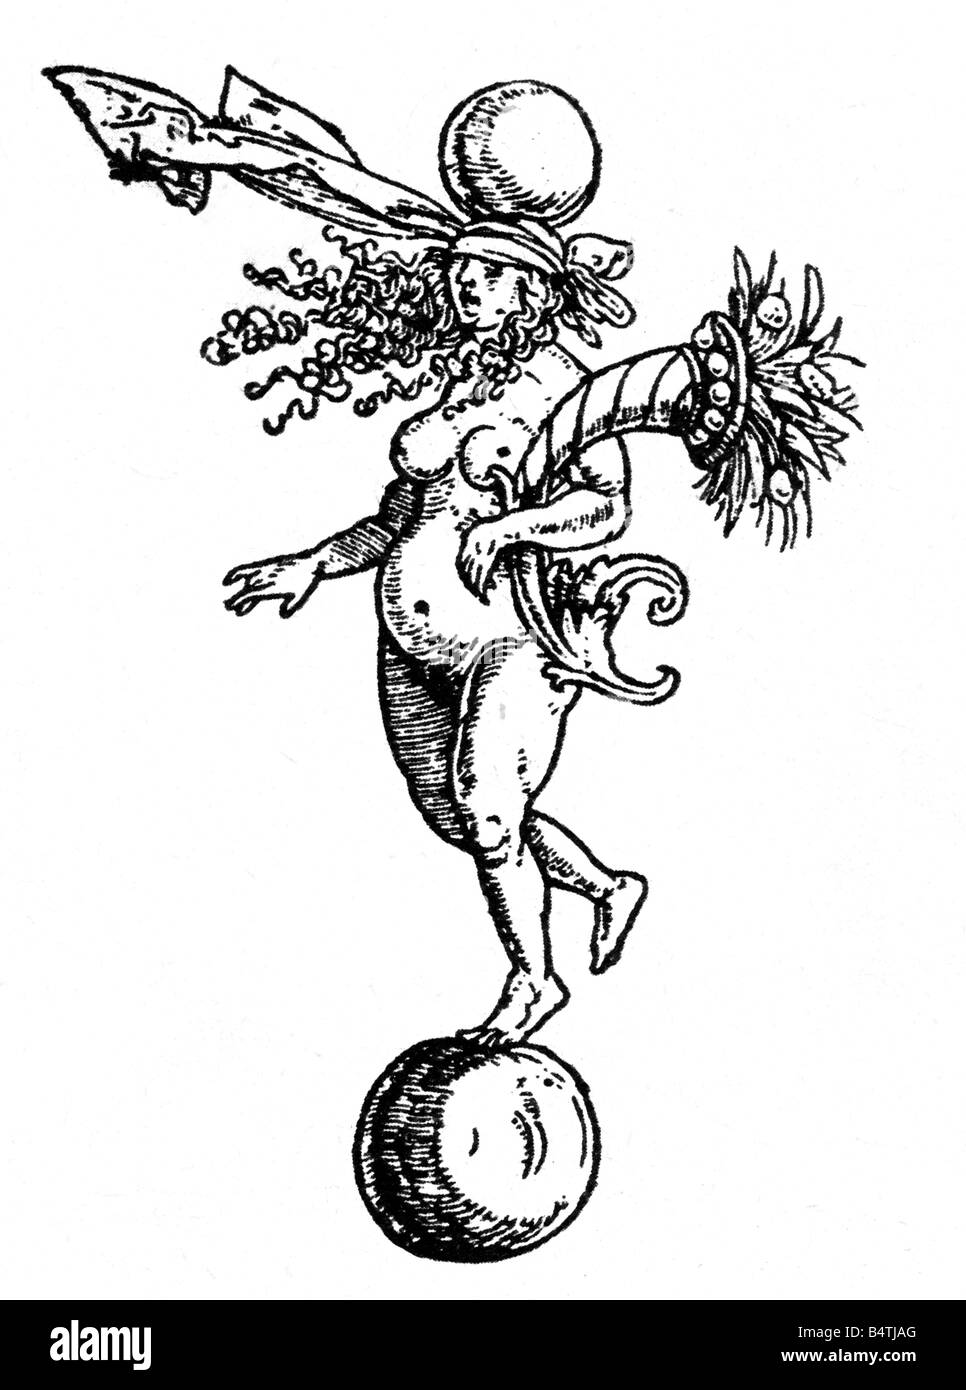 Fortuna, römische Göttin Fortuna, Holzschnitt von Albrecht Dürer (1471 - 1528), Artist's Urheberrecht Stockbild